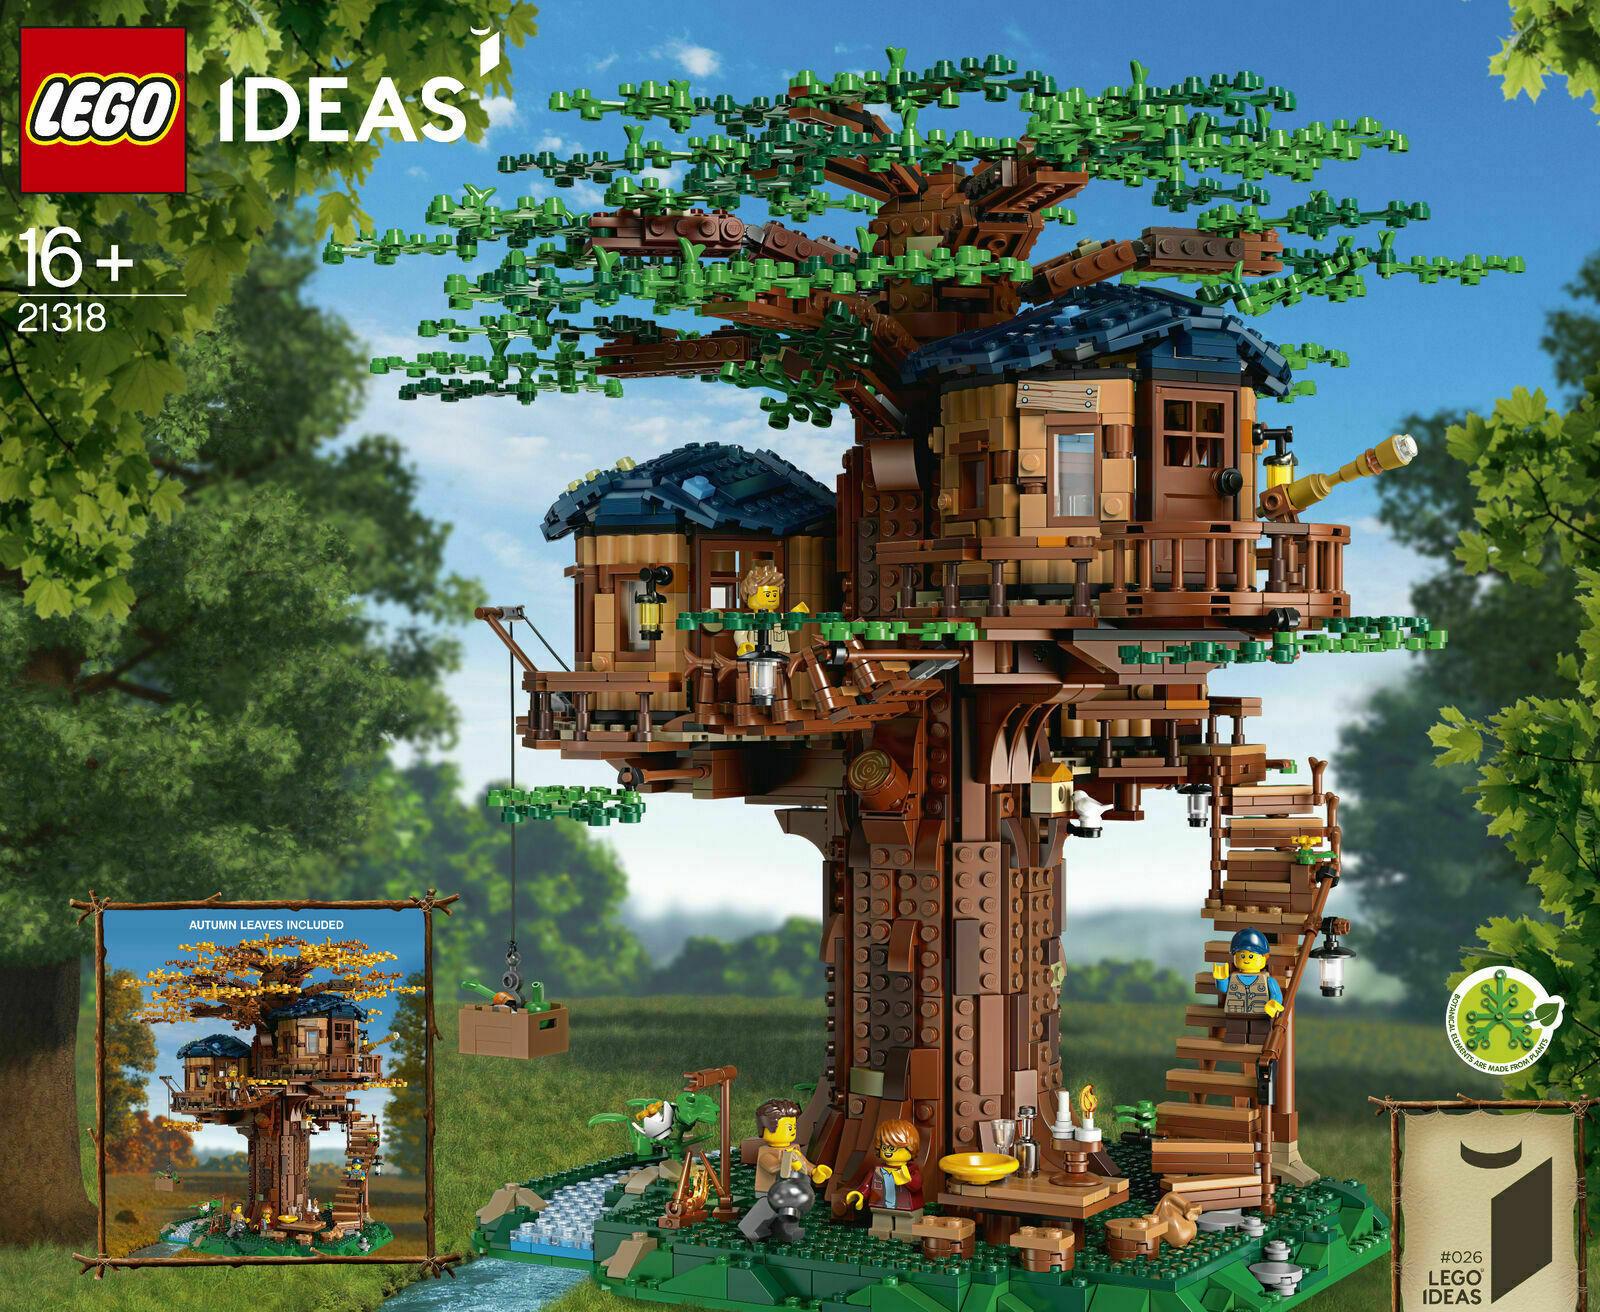 LEGO Ideas  21318 TREE  HOUSE Set Officially Licensed NIB Sealed US Seller  vente en ligne